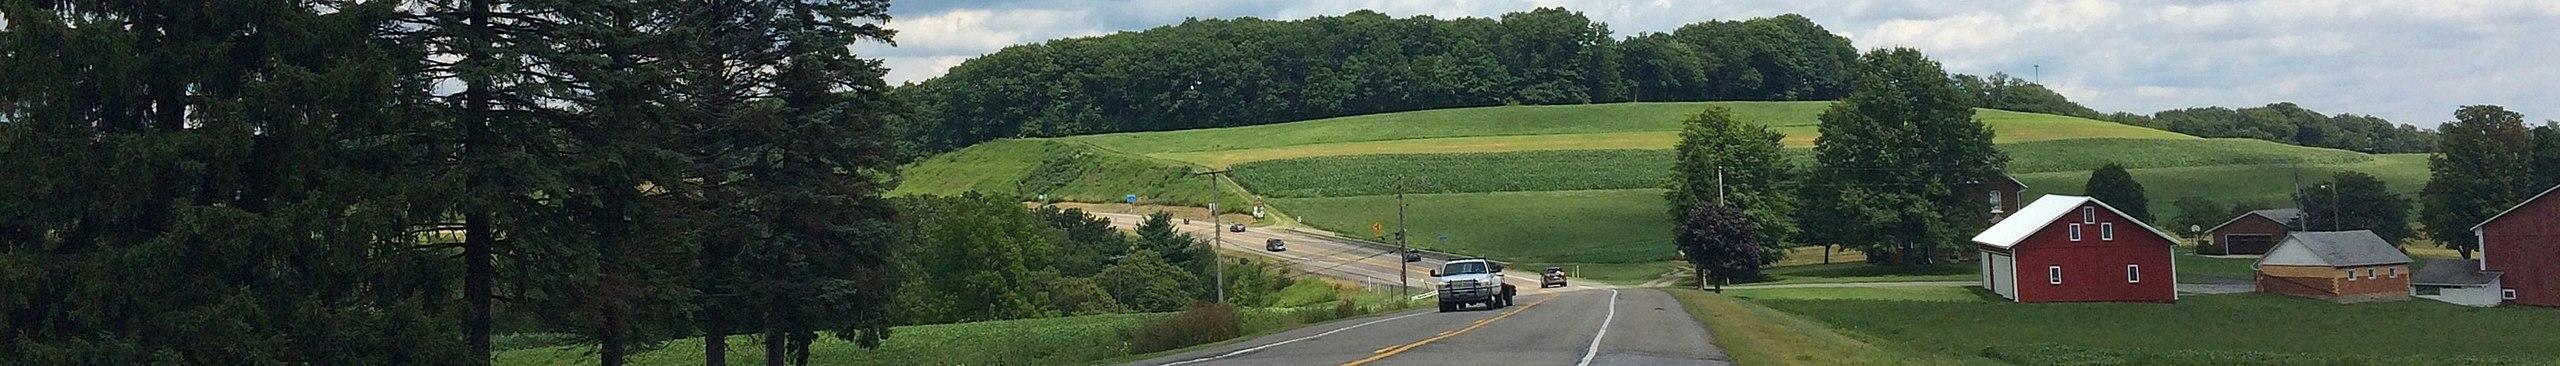 User:AndreCarrotflower/Buffalo-Pittsburgh Highway – Travel guide at